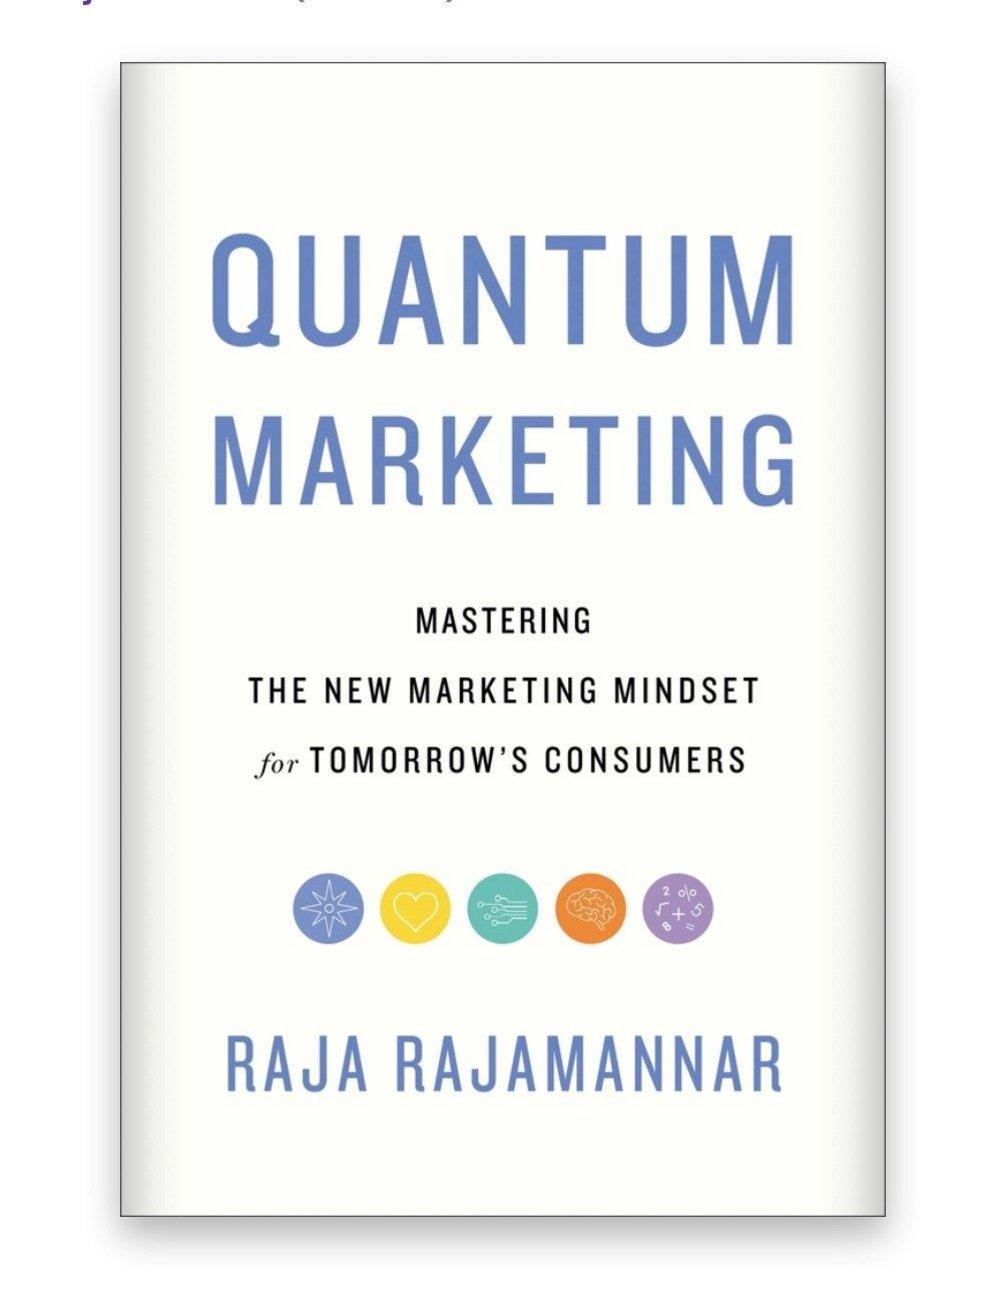 Body image for Watch: Mastercard CMO Raja Rajamannar on marketing's 'fifth paradigm'